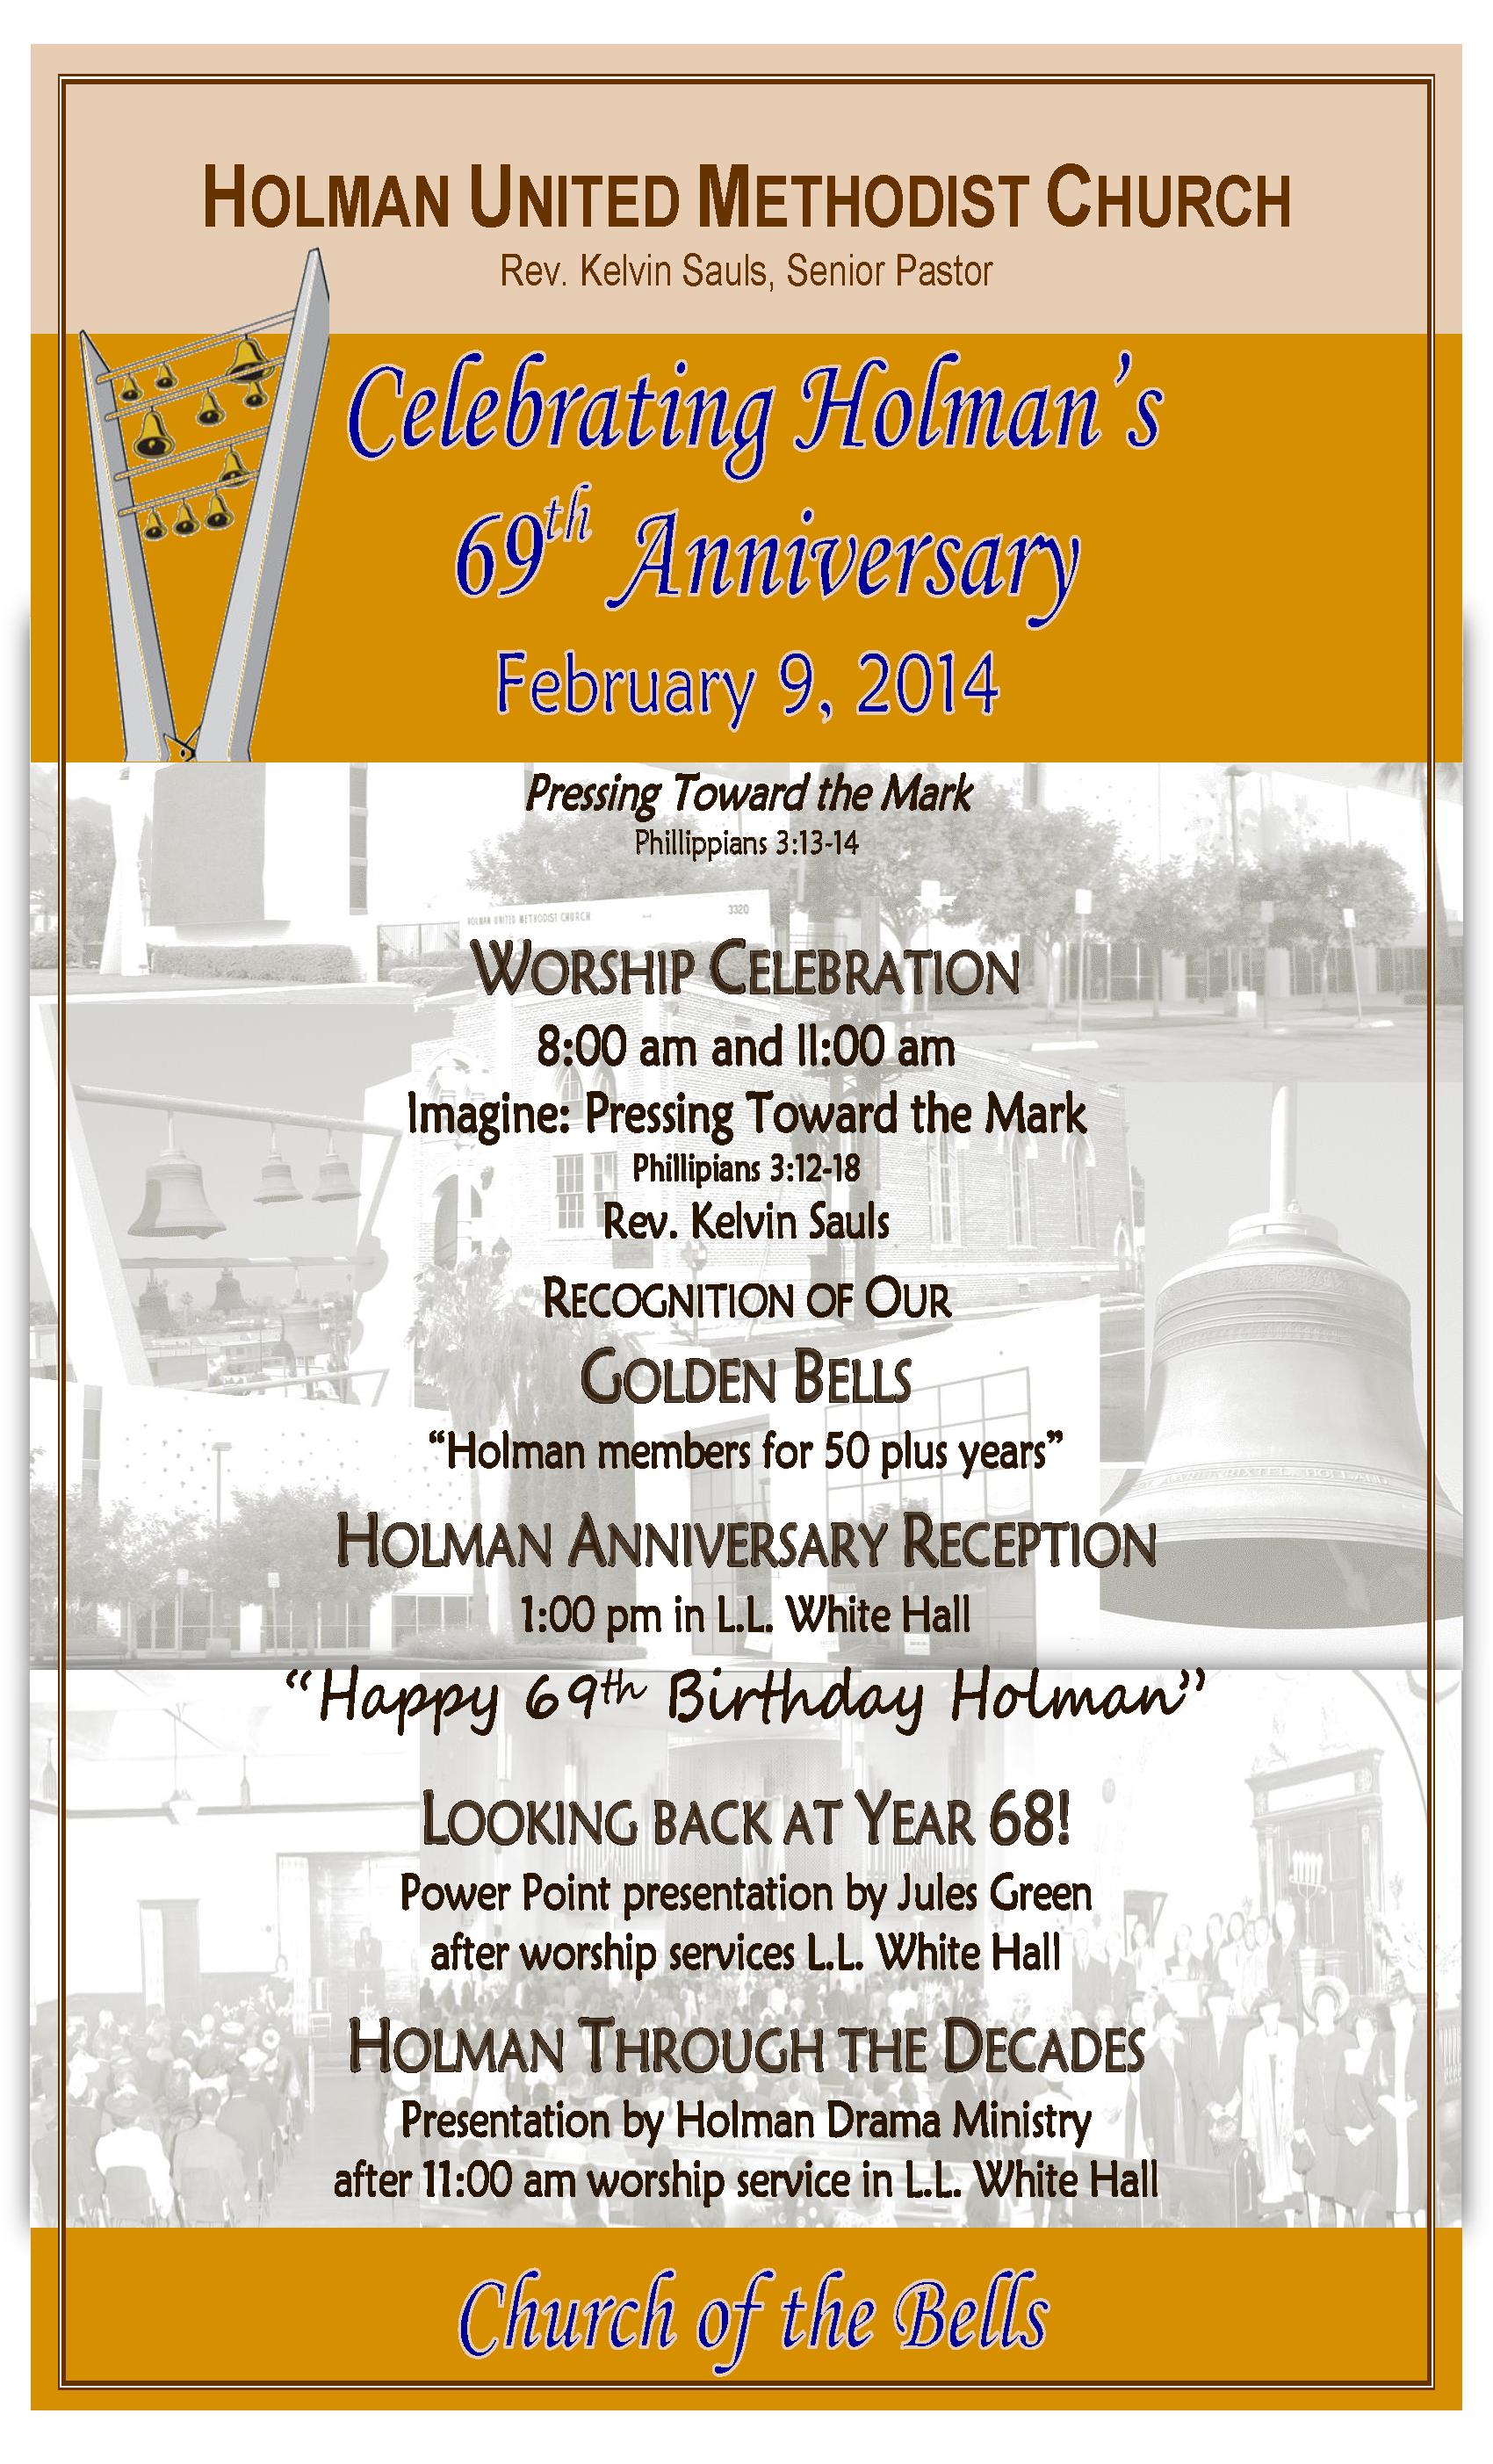 69th Church Anniversary Celebration Holman United